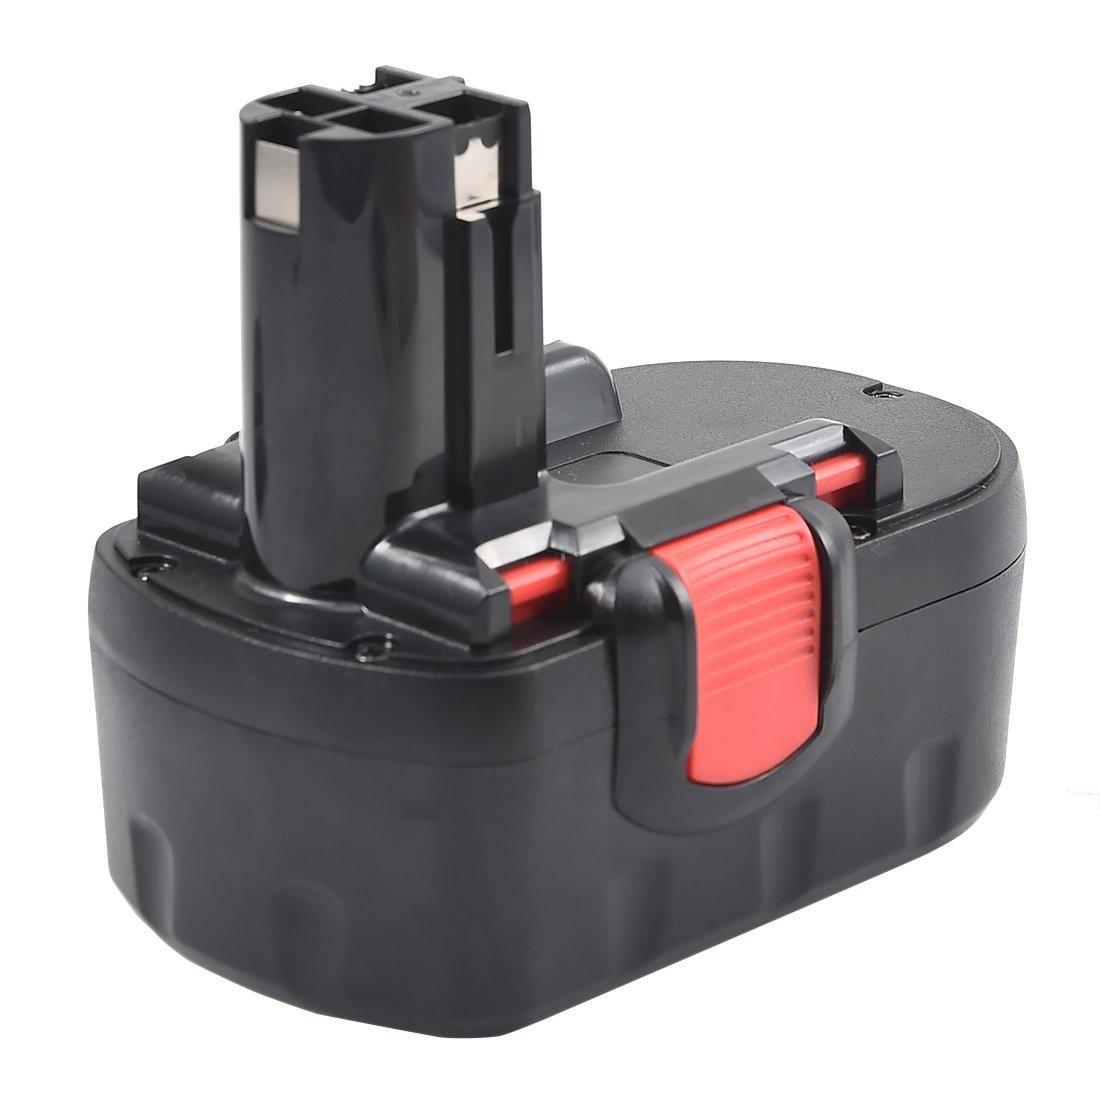 DSTE Ni-MH Power Tool Battery for Bosch 2 607 335 266,2 607 335 278,2 607 335 536,2 607 335 680,2 607 335 688,2 607 335 696,2 610 909 020,BAT025,BAT026,BAT160,BAT180,BAT181,BAT189